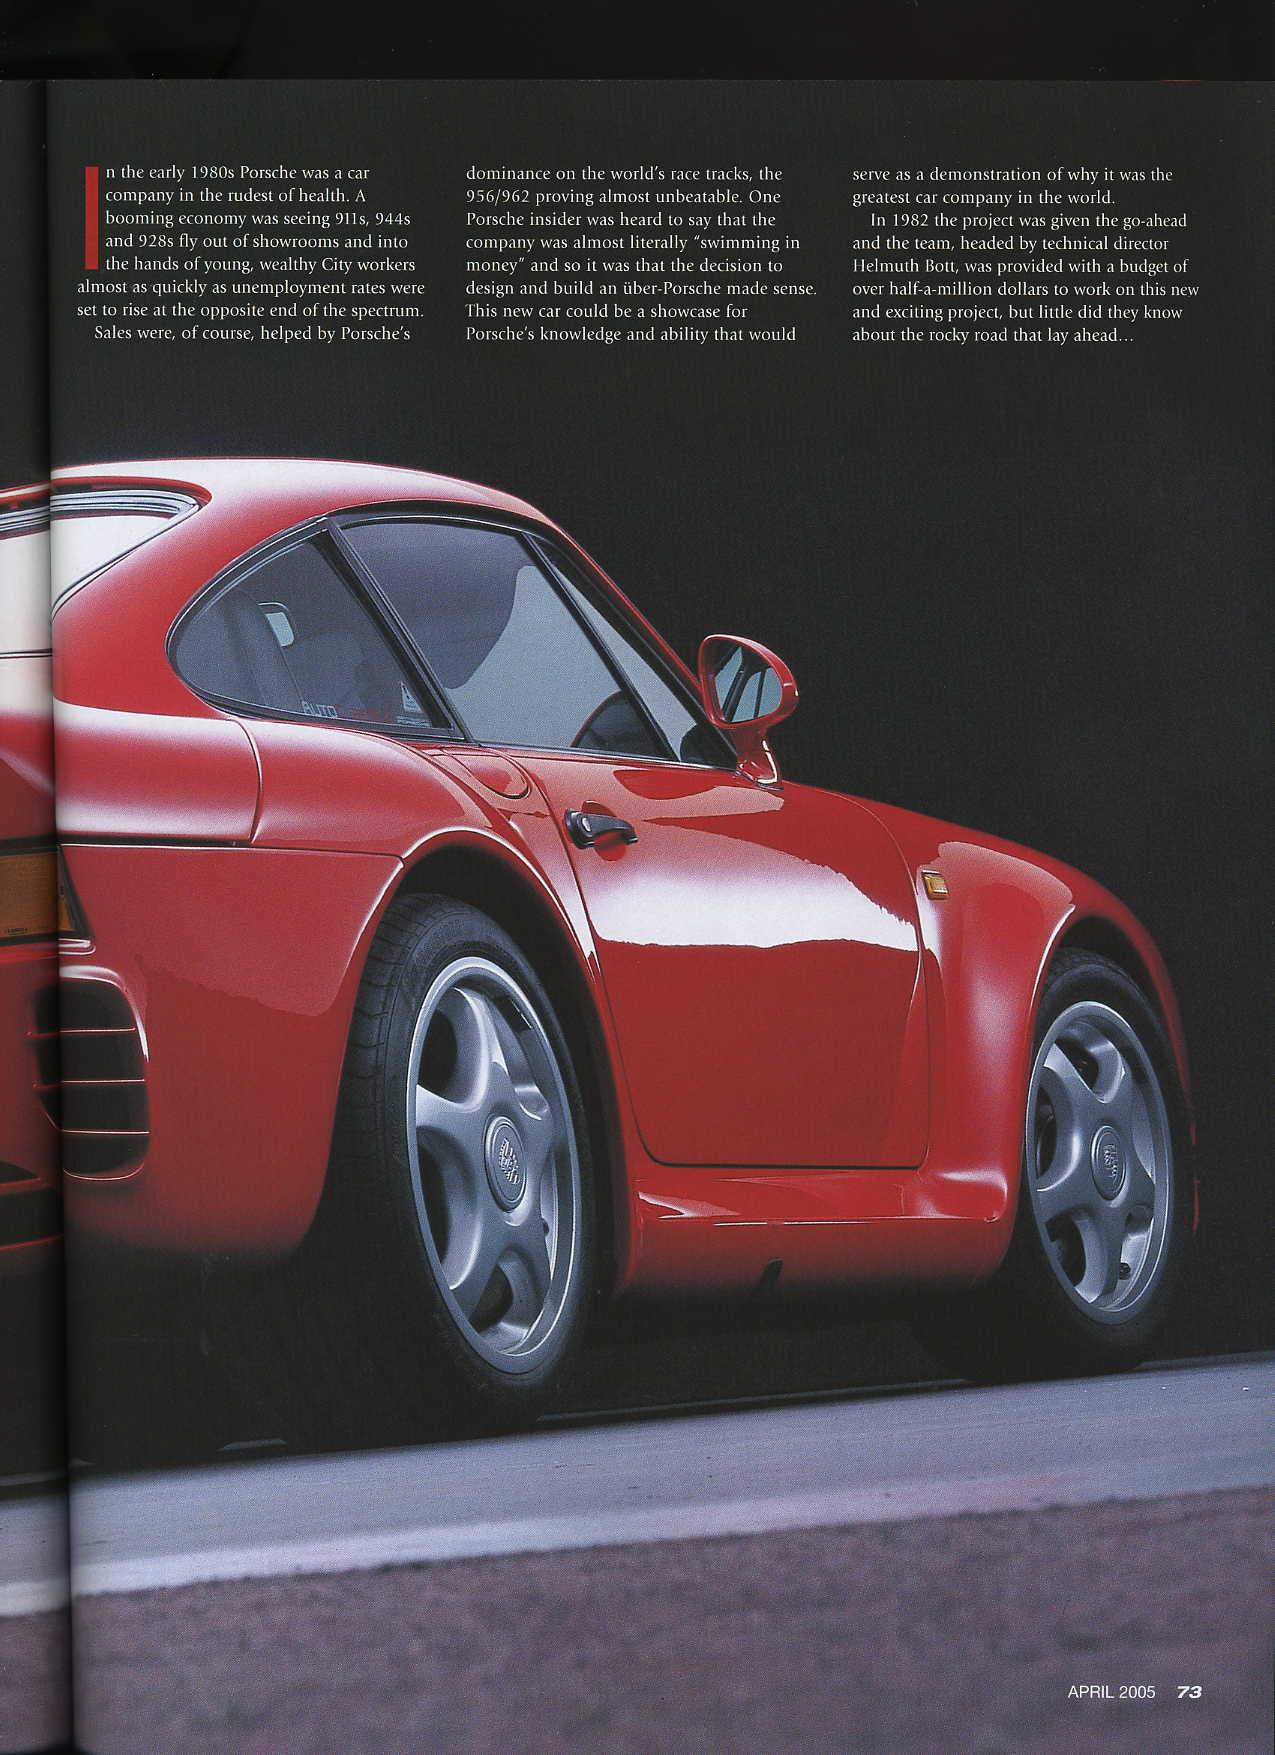 The Essential Guide Porsche 959 Gt Purely Porsche April